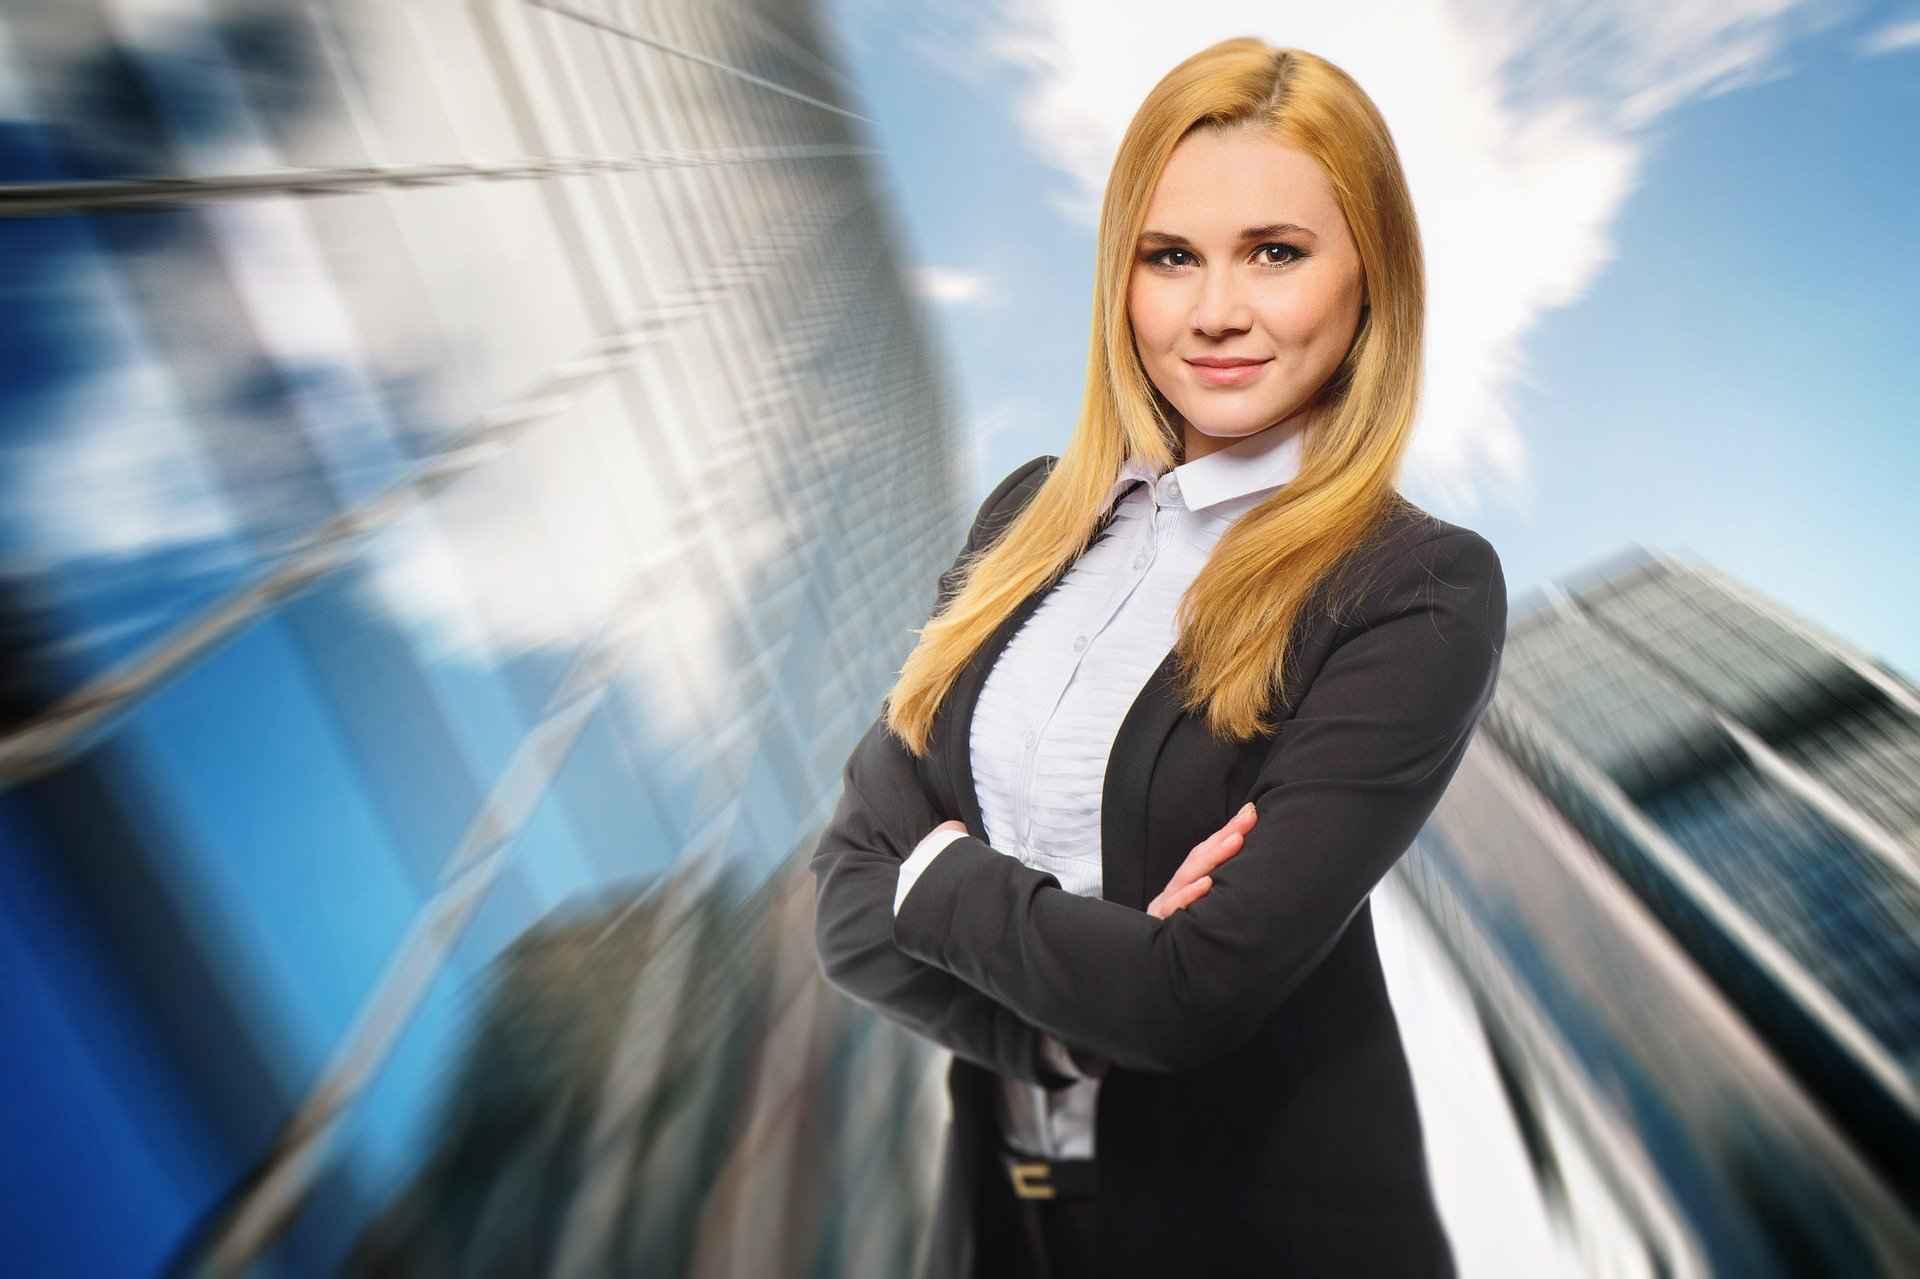 driven businesswoman